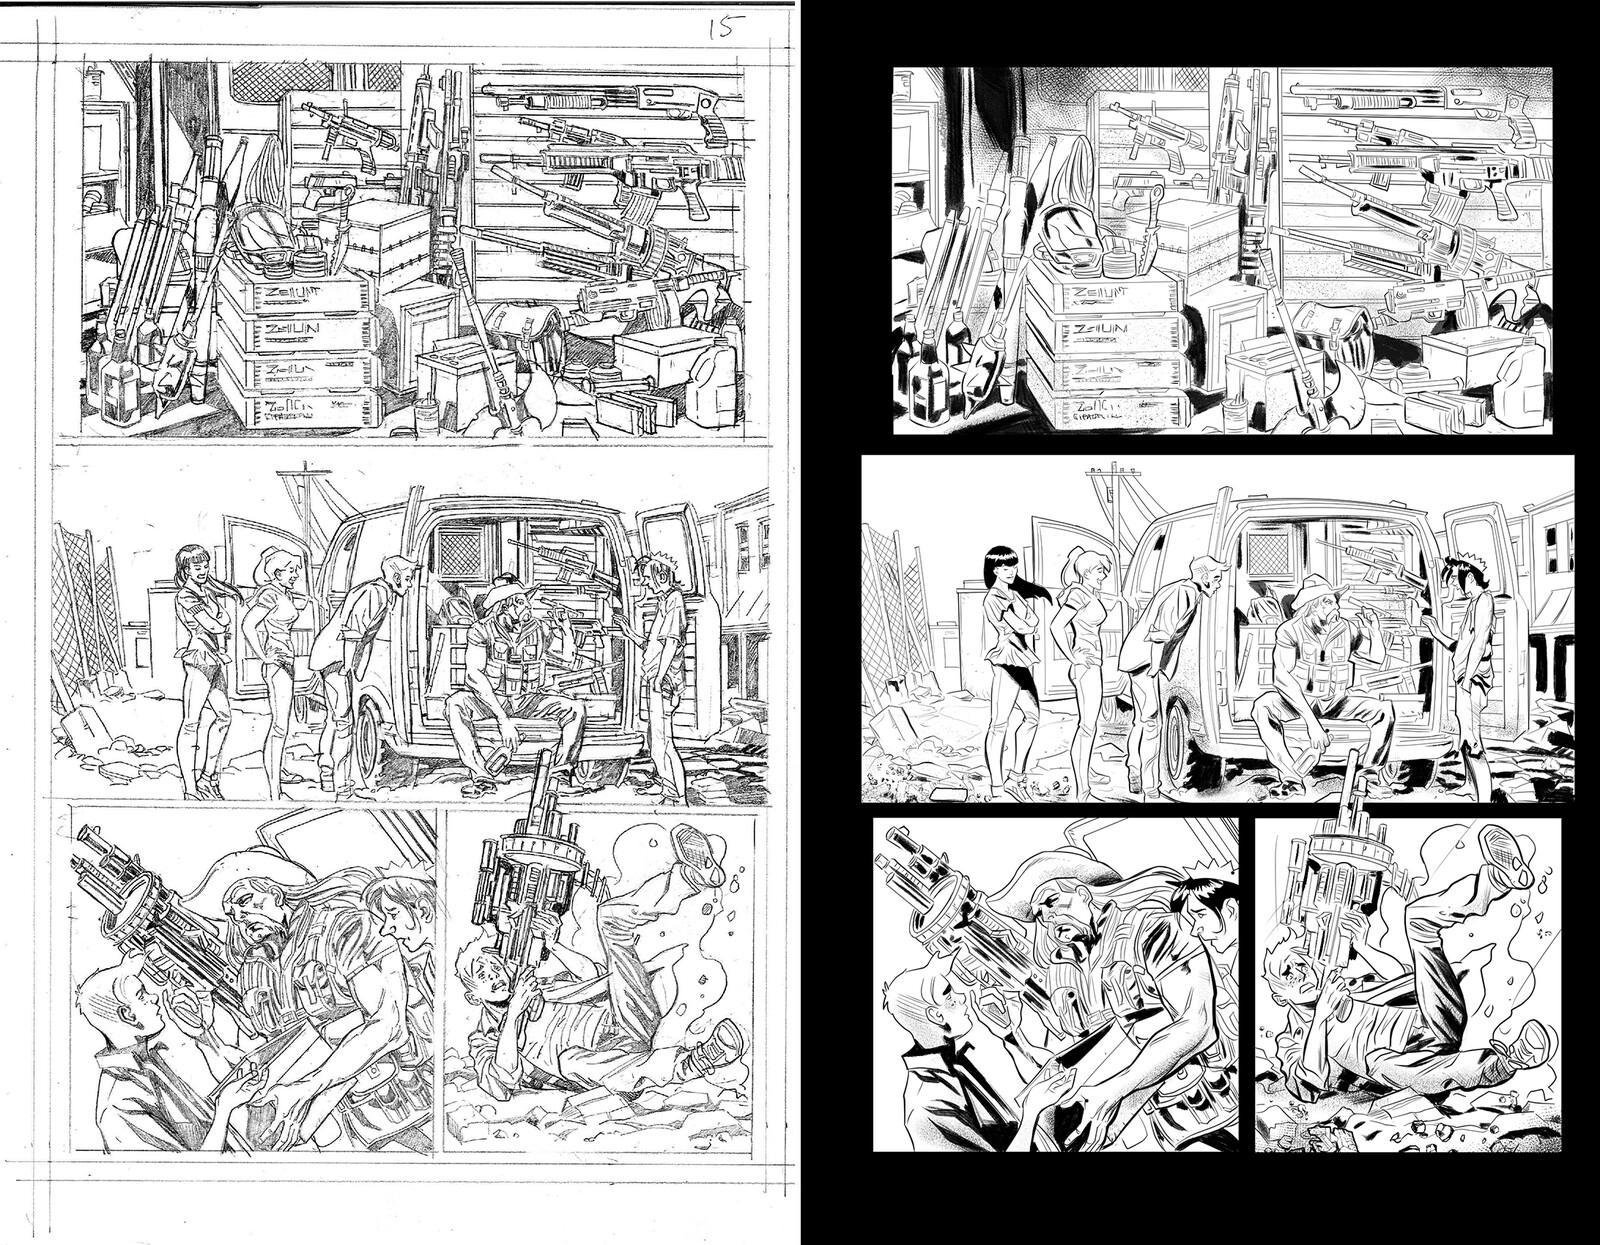 Jughead the Hunger vs Vampironica #4 Pencils by Pat & Tim Kennedy